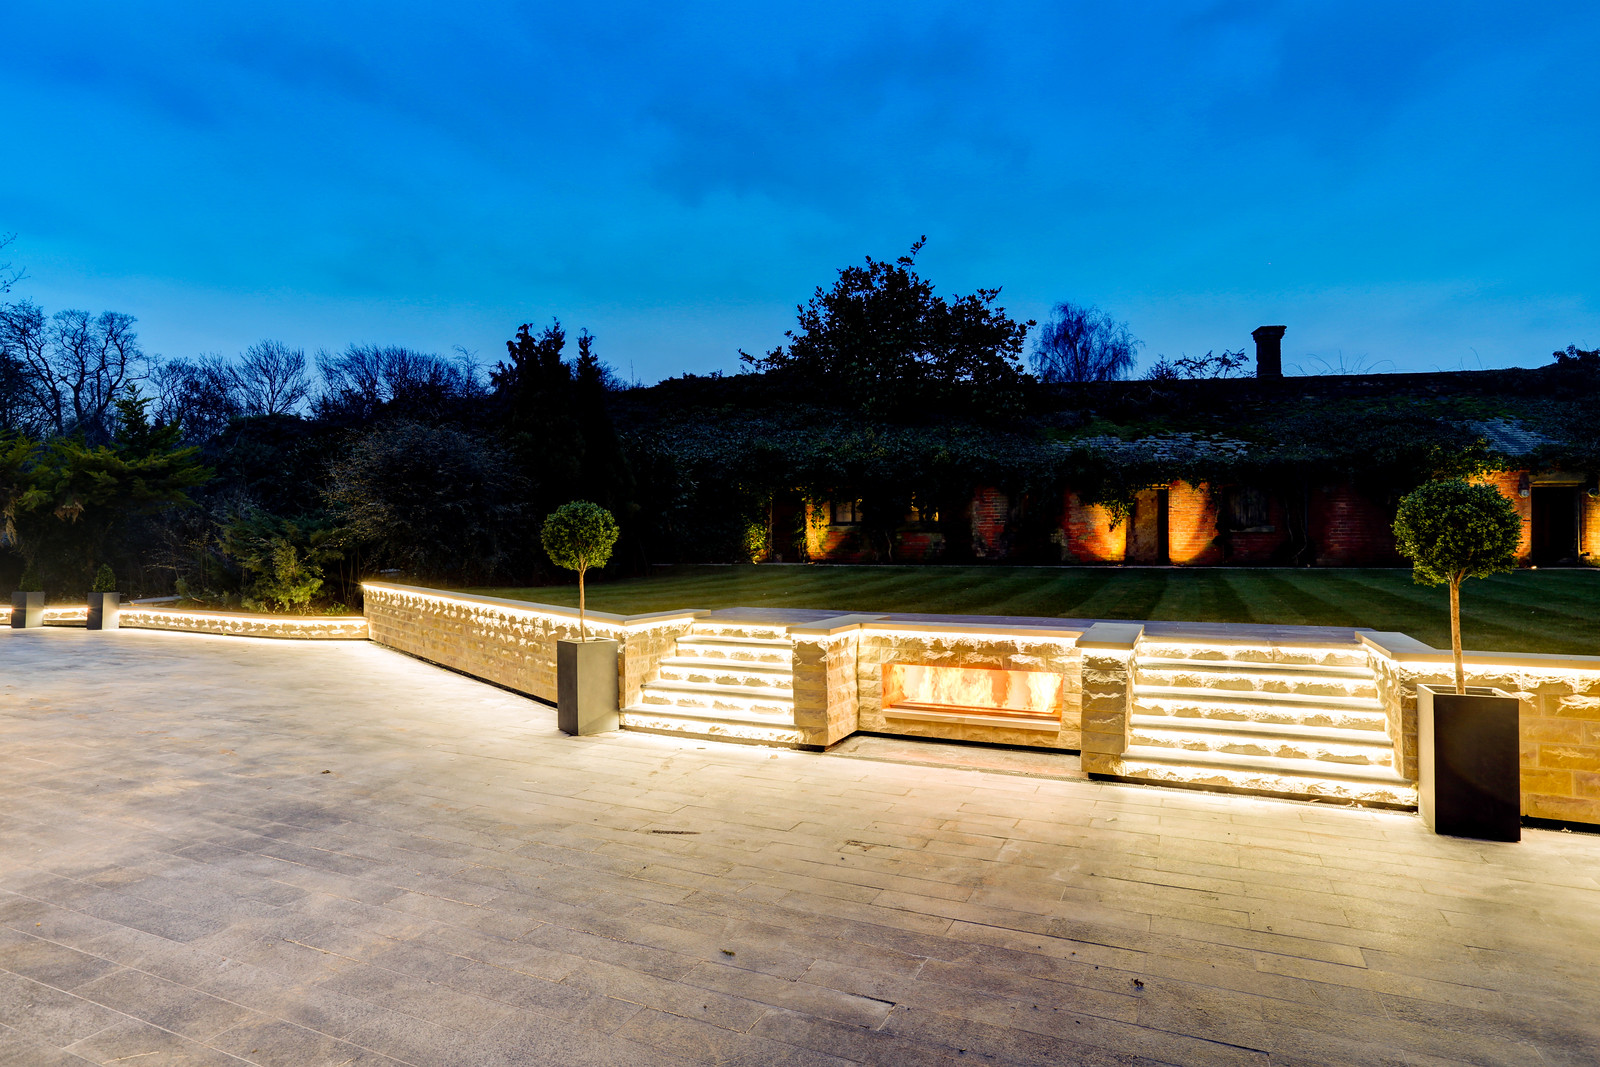 Garden design, luxury home in Colston Bassett, Nottinghamshire by Guy Phoenix